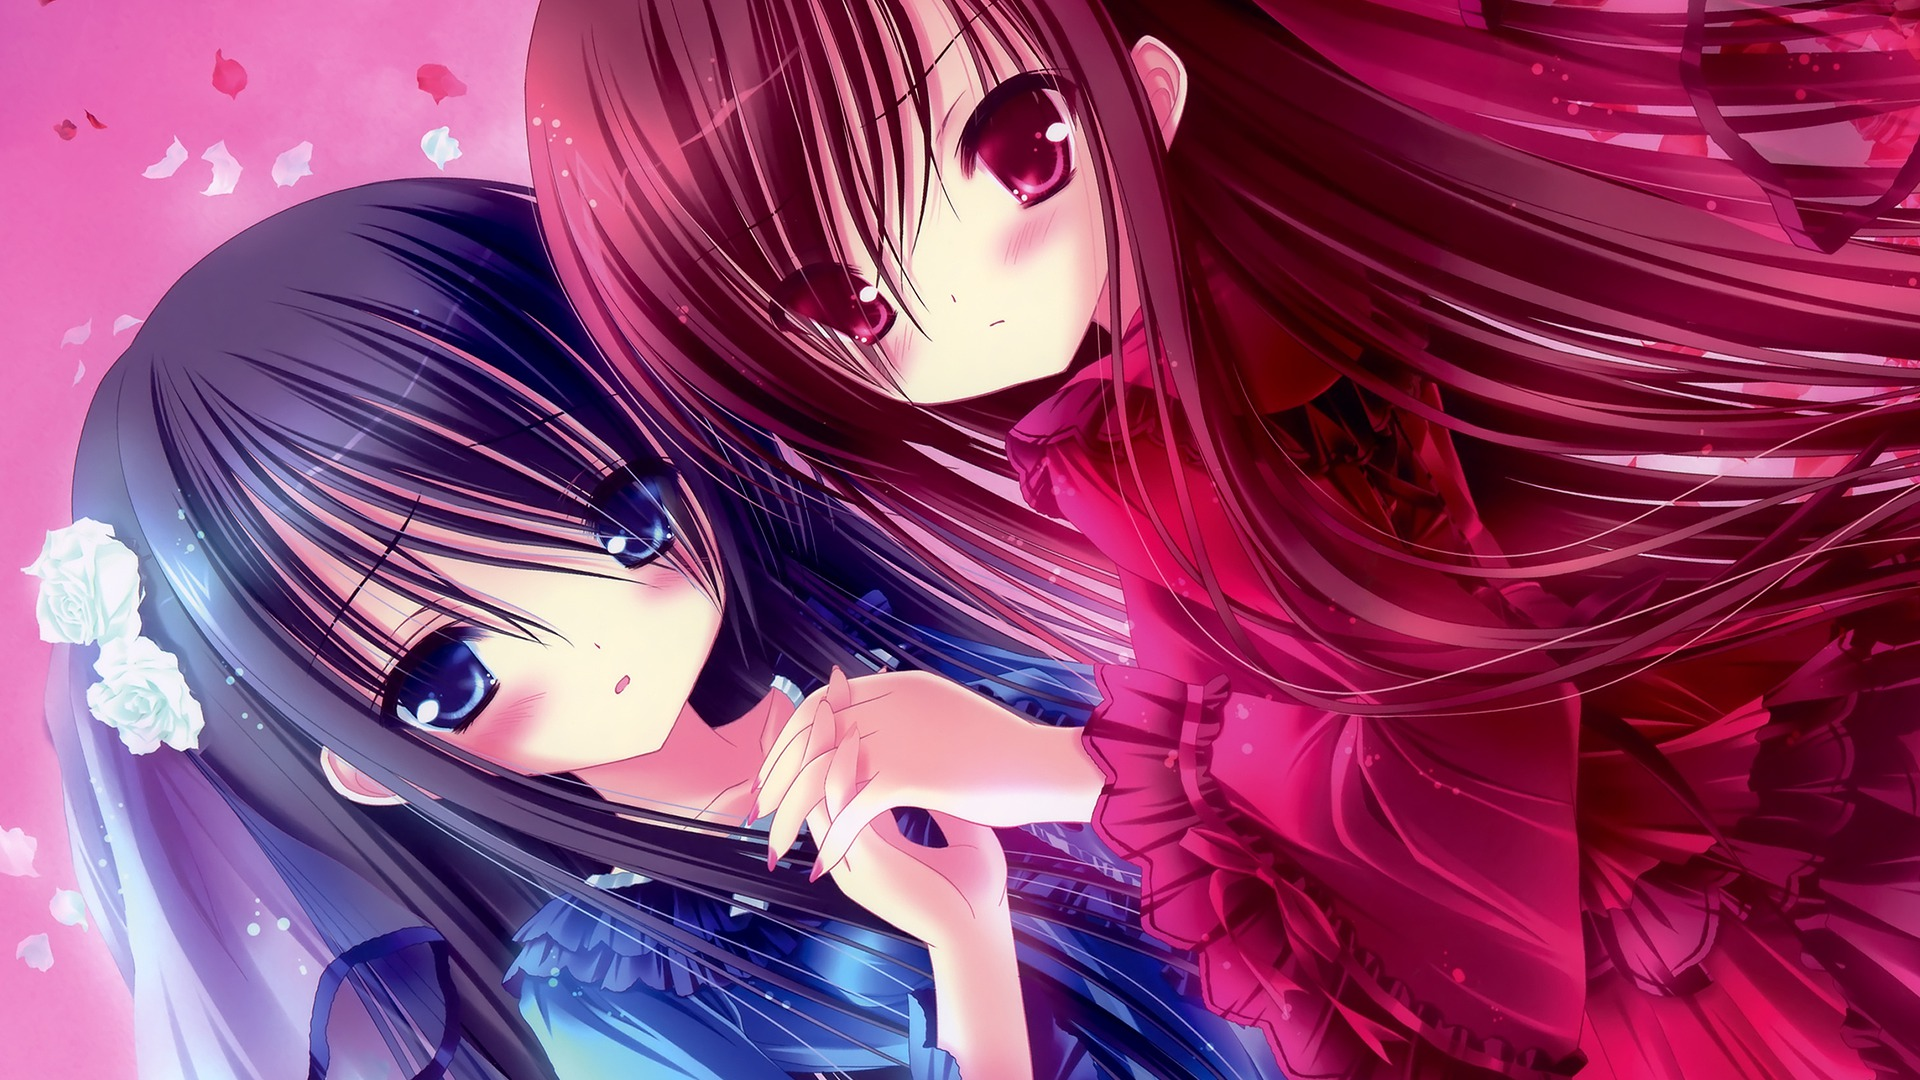 [47+] Cute Anime Wallpapers HD on WallpaperSafari